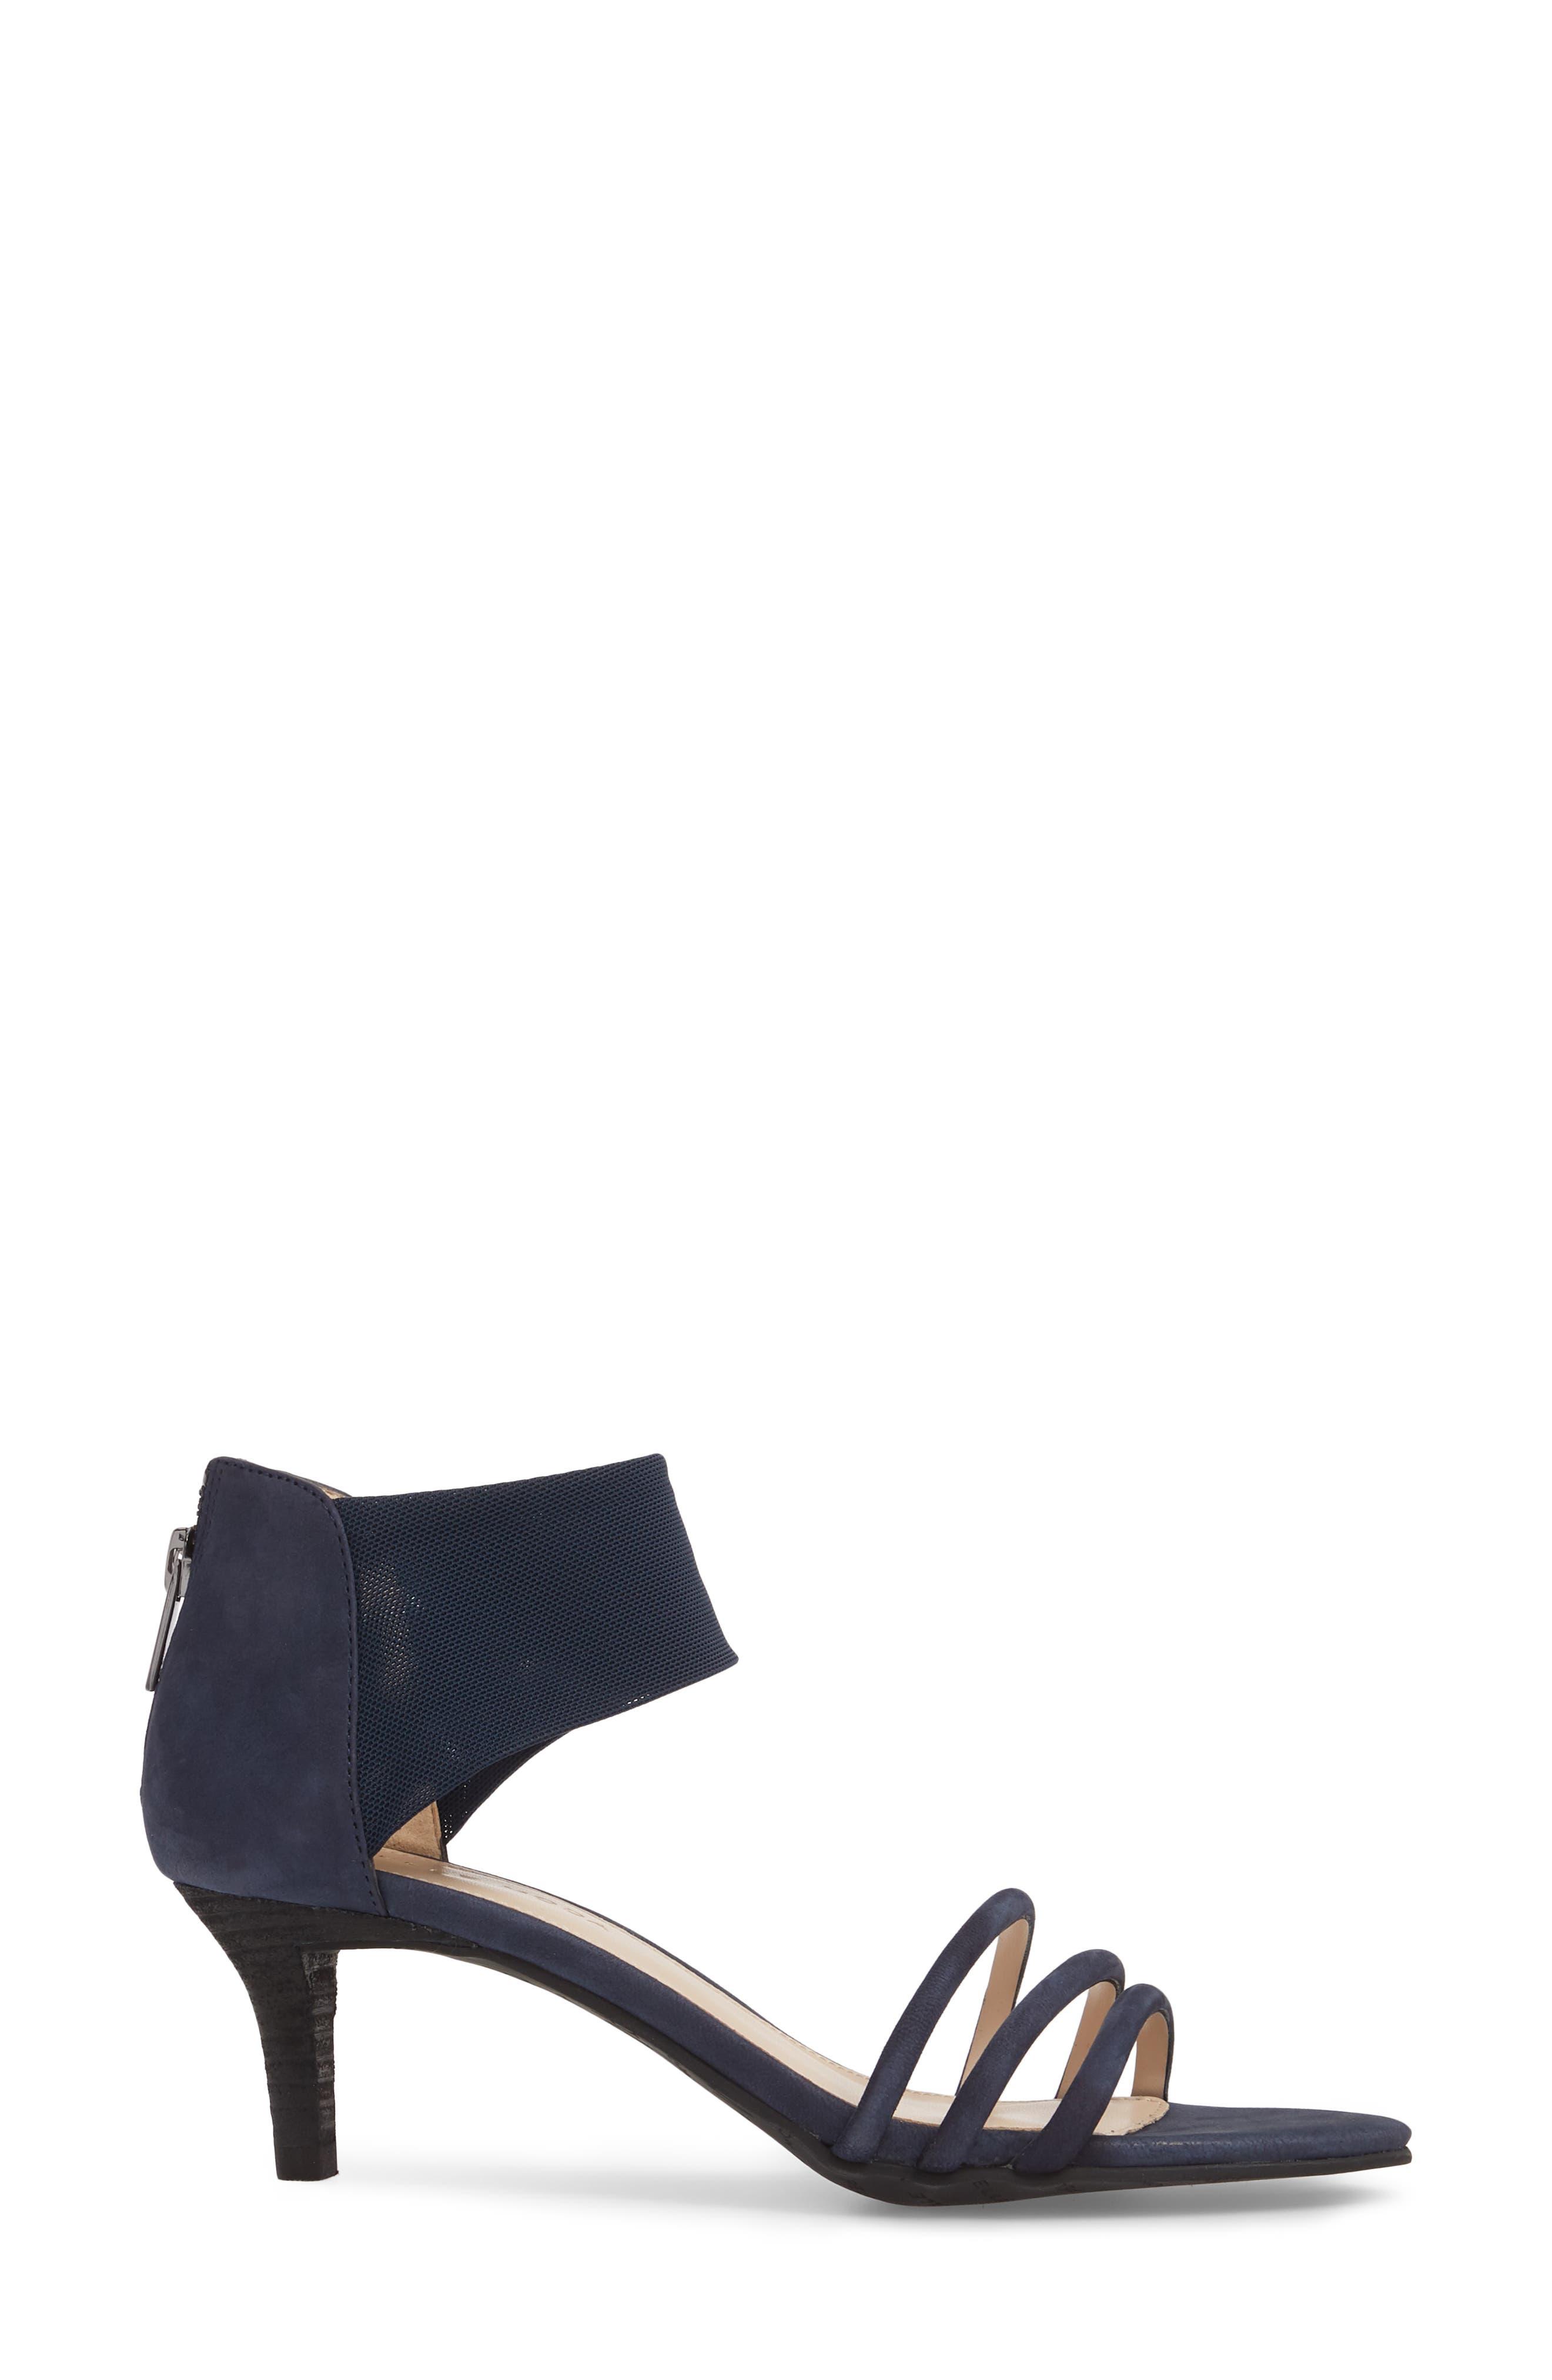 Berri Ankle Cuff Sandal,                             Alternate thumbnail 9, color,